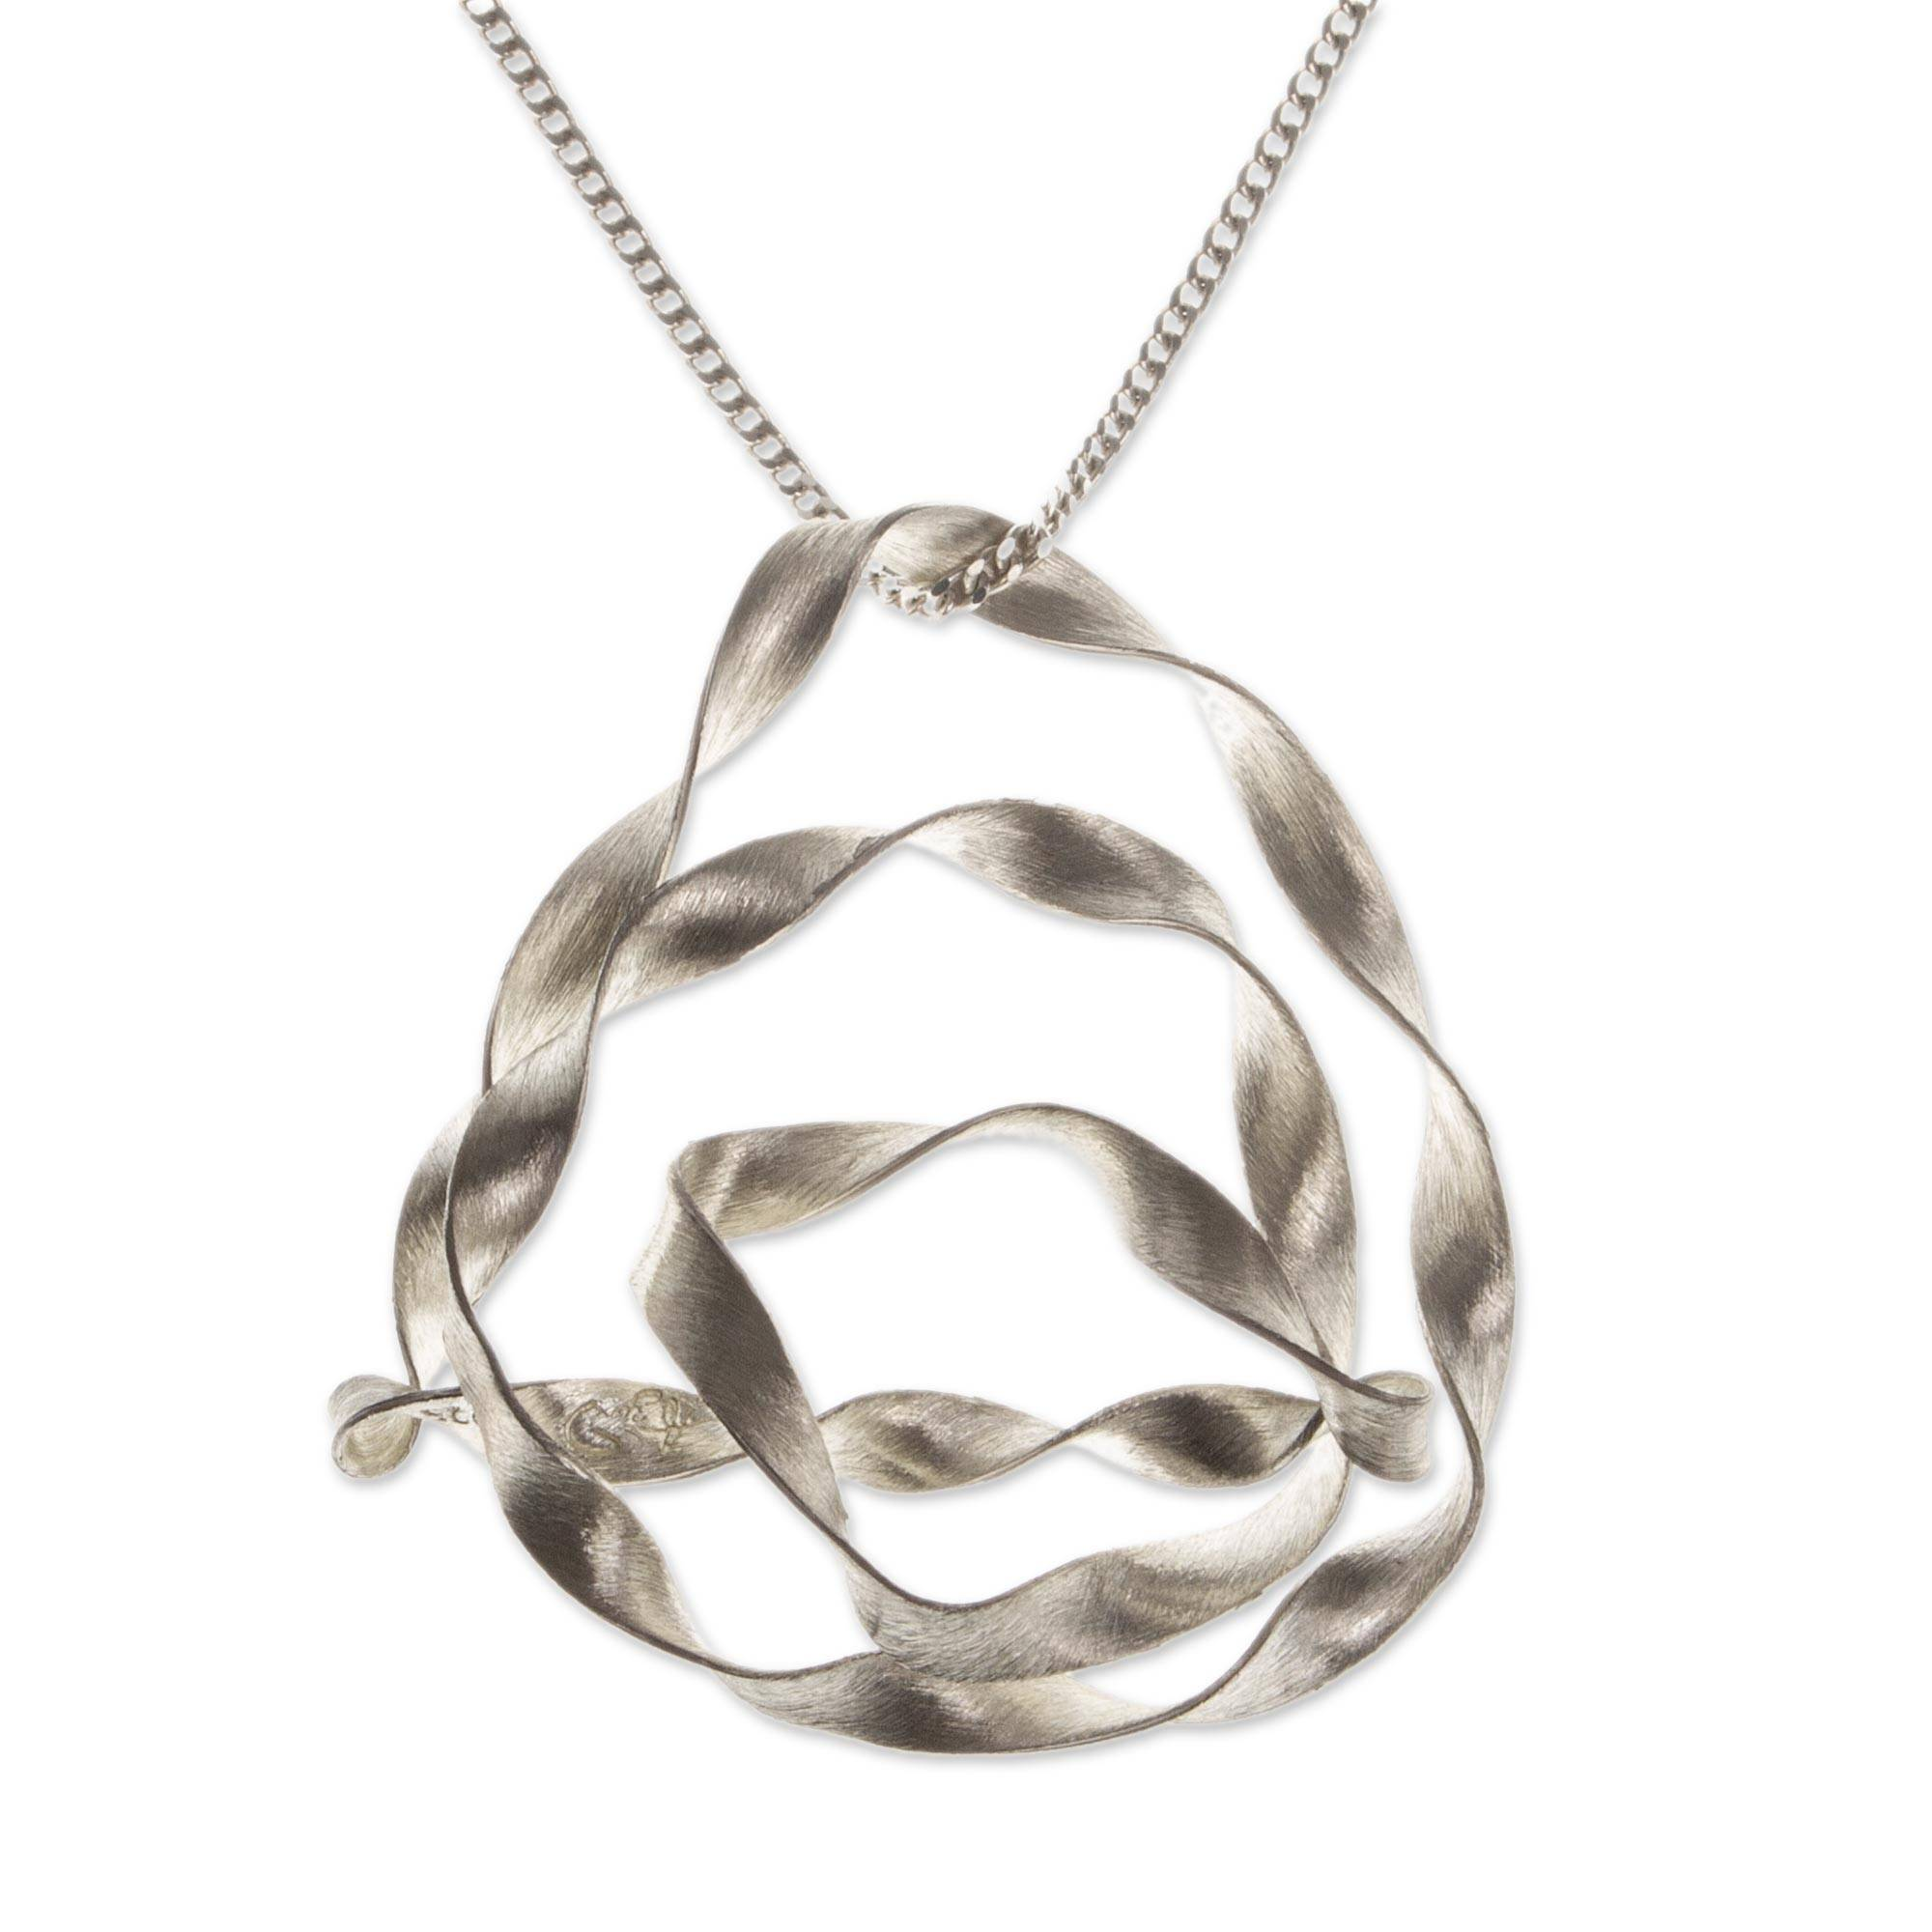 Fair Trade Sterling Silver Pendant Necklace, 'Ribbon Tribute'